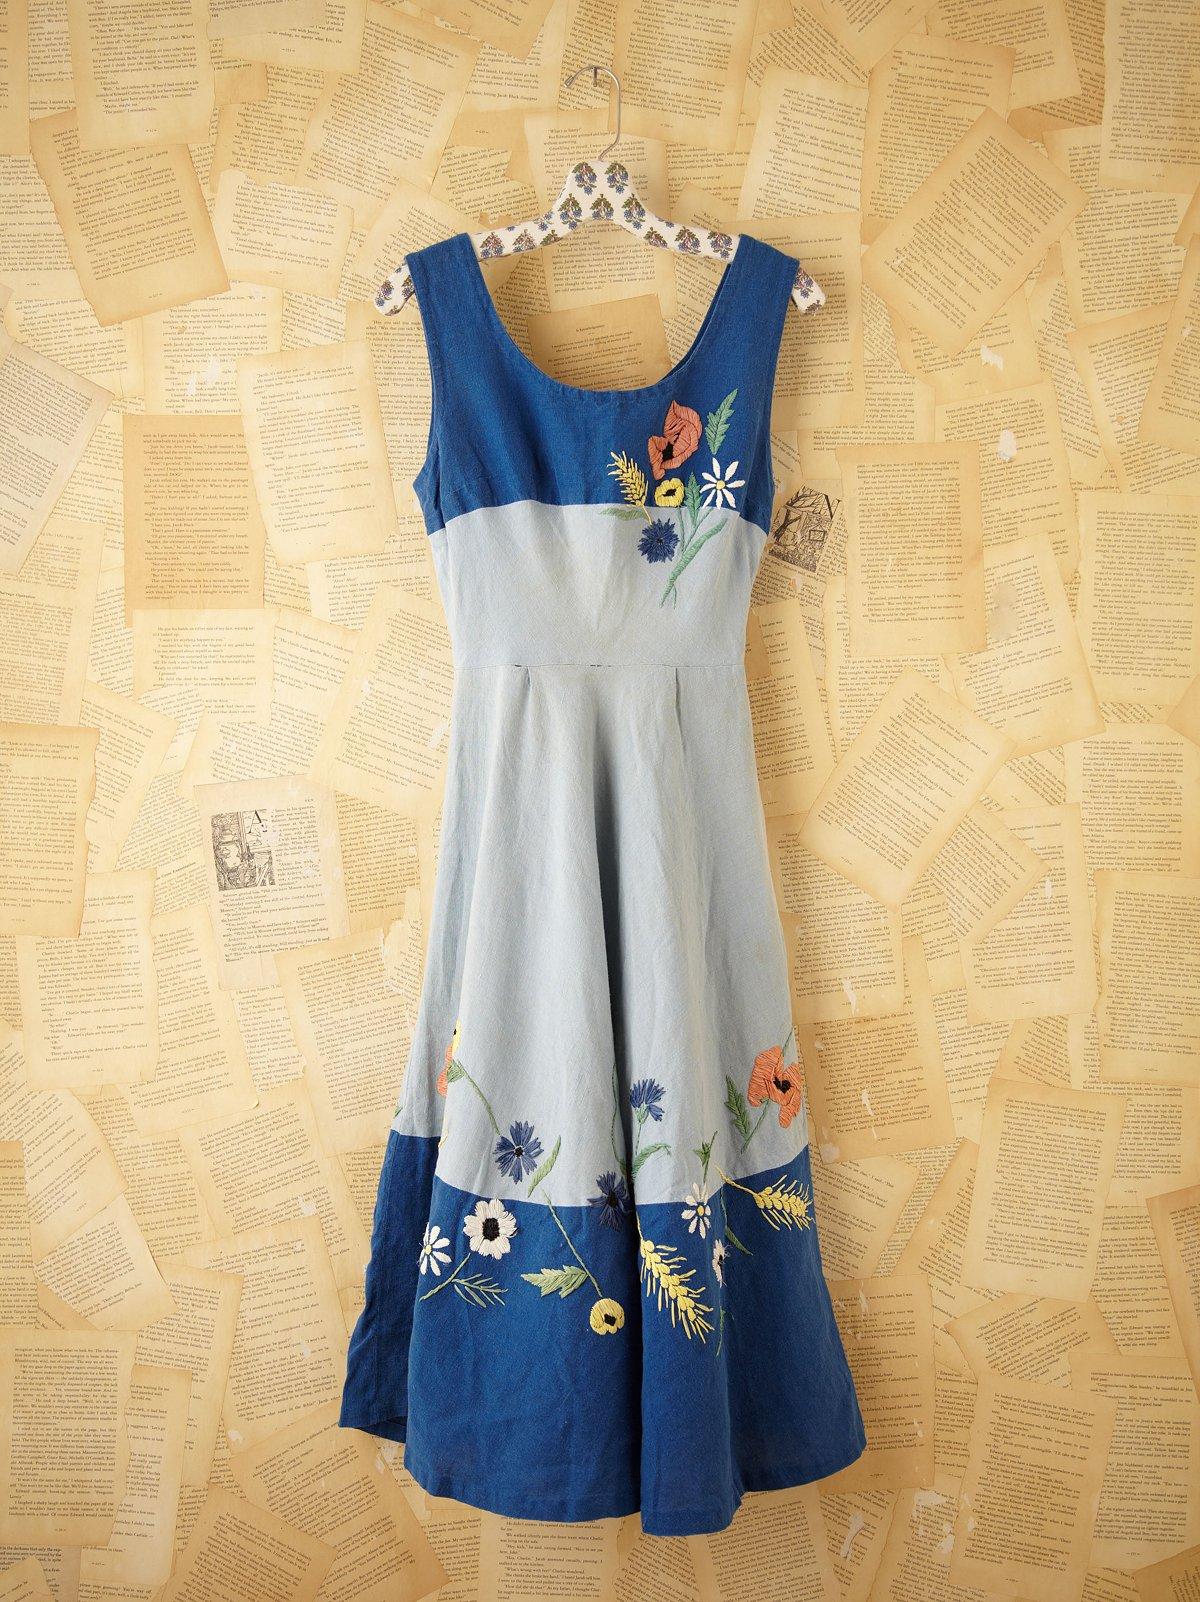 Vintage Picnic Dress